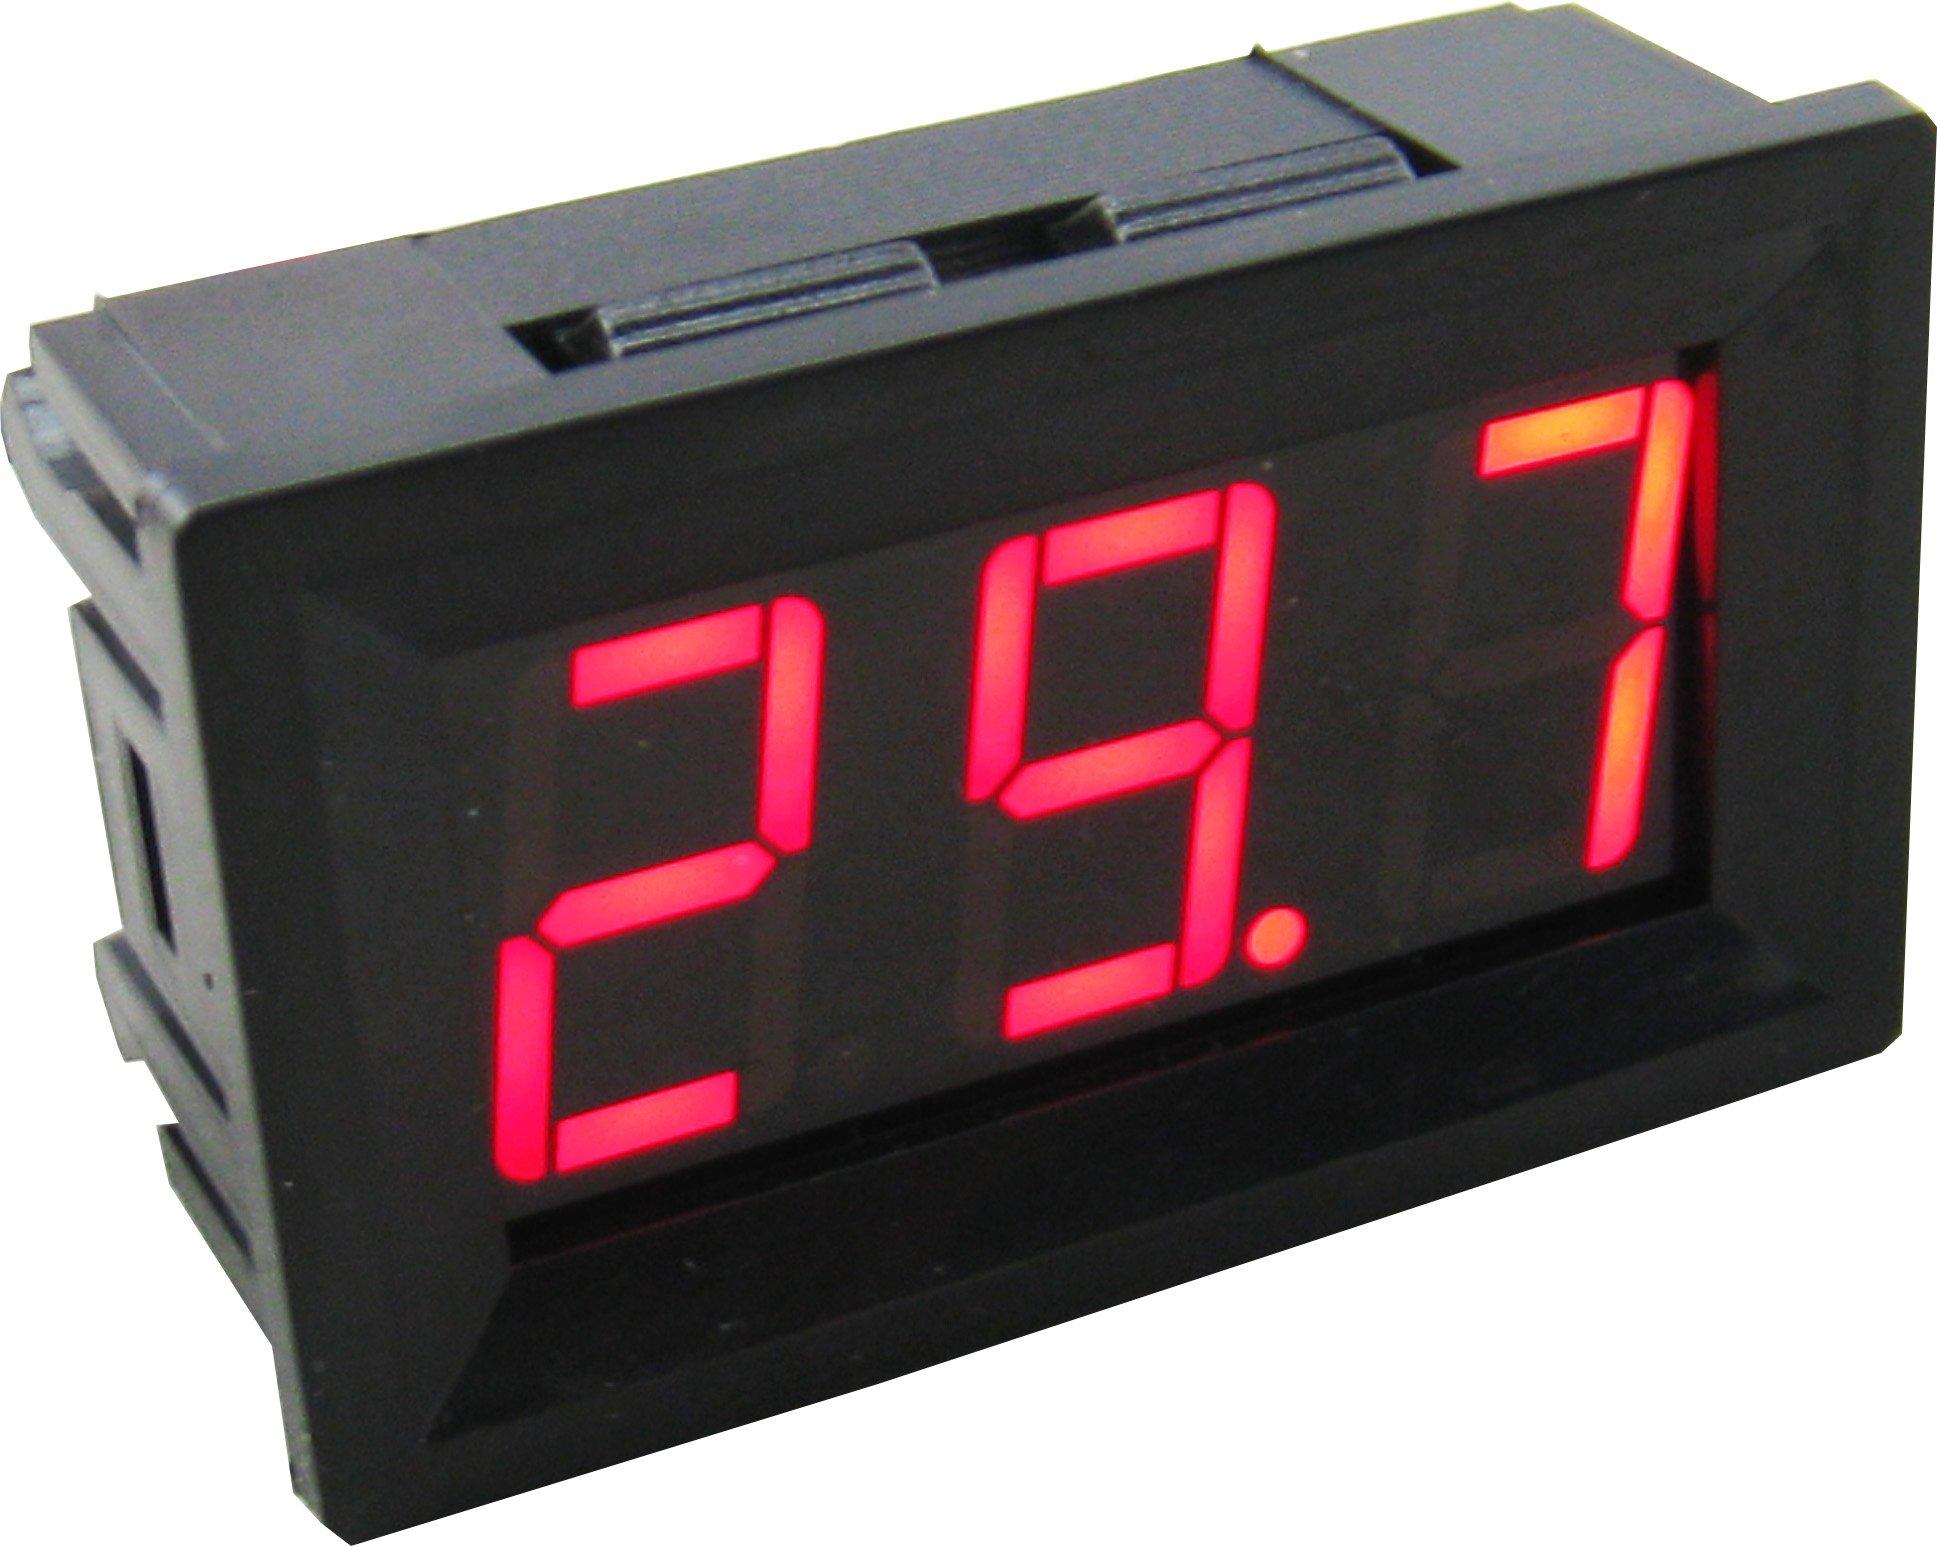 Yeeco -50-110 °C Degrees Celsius Digital Thermometer Car/Motor Temperature Panel Meter Temp Gauge Monitor Red Led Display with Waterproof B3950-10k Probe Sensor DC 12V Black Shell